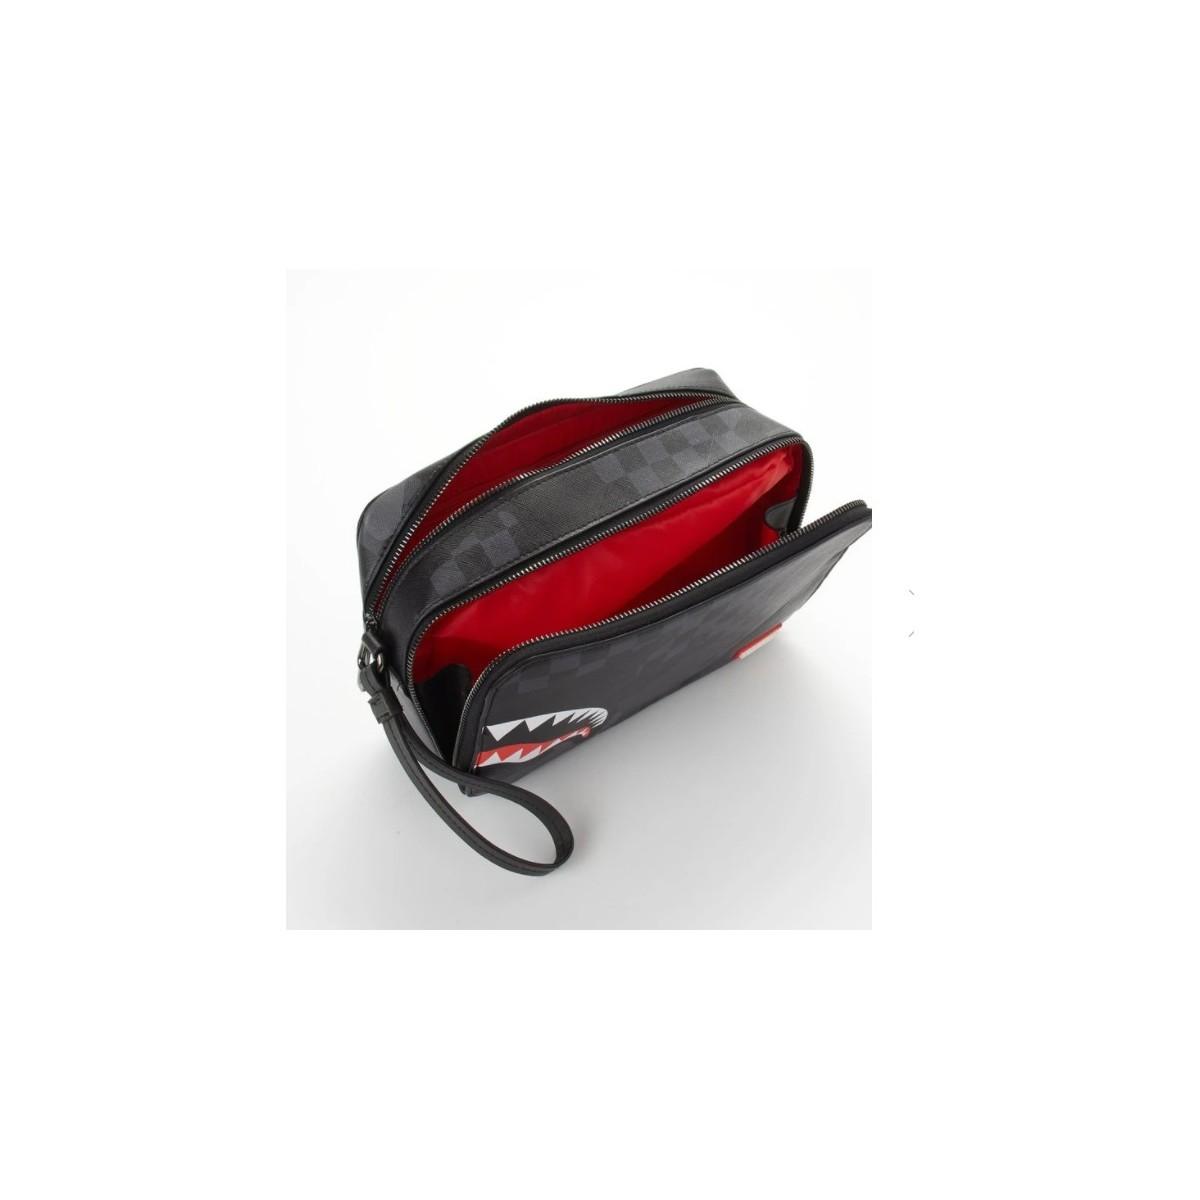 Borsa - 3am bag 3289